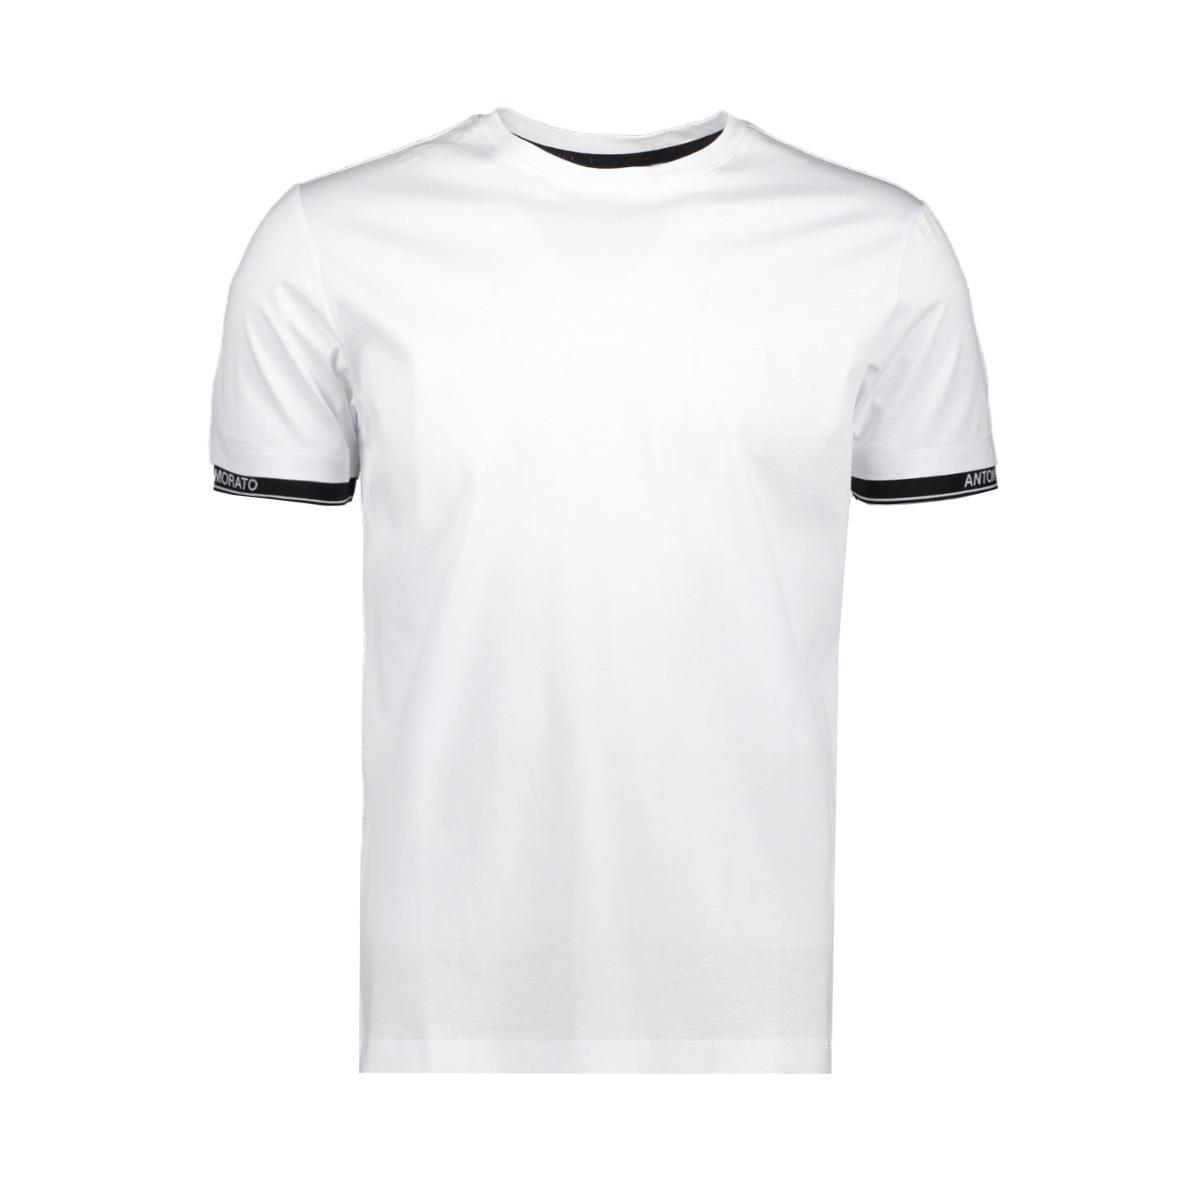 orange line mmks01837 antony morato t-shirt 1000 white